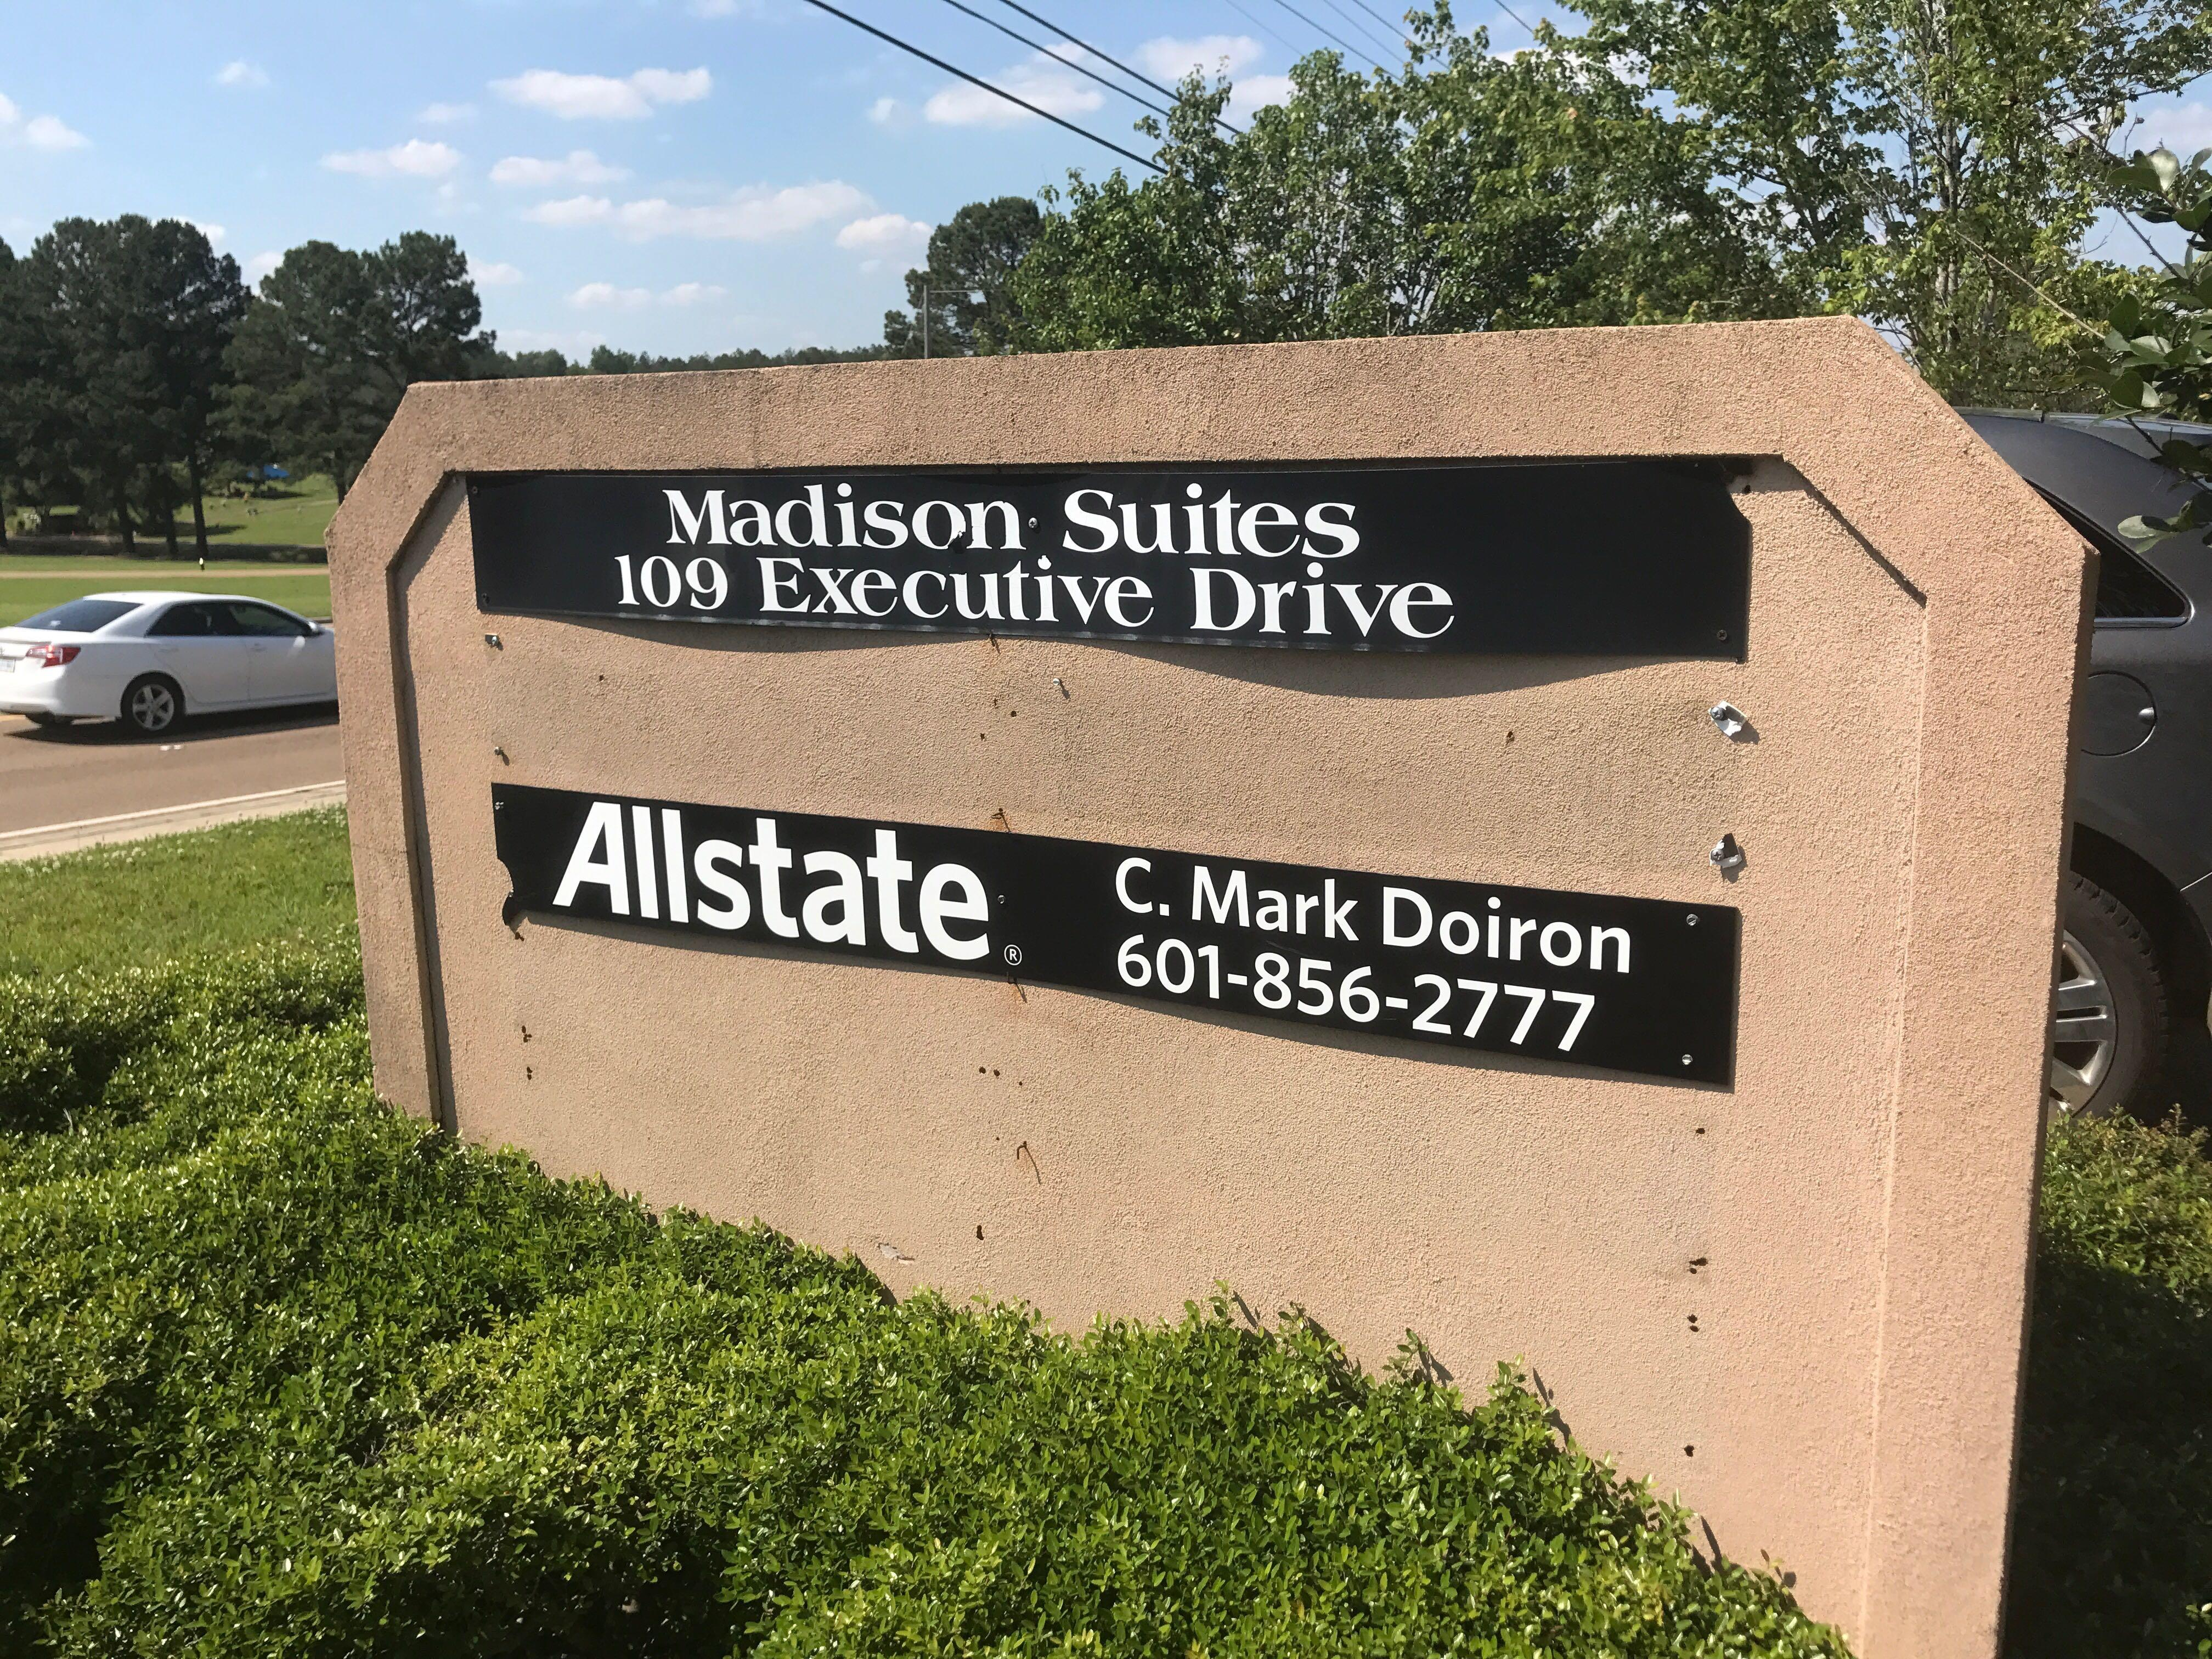 C. Mark Doiron: Allstate Insurance image 2